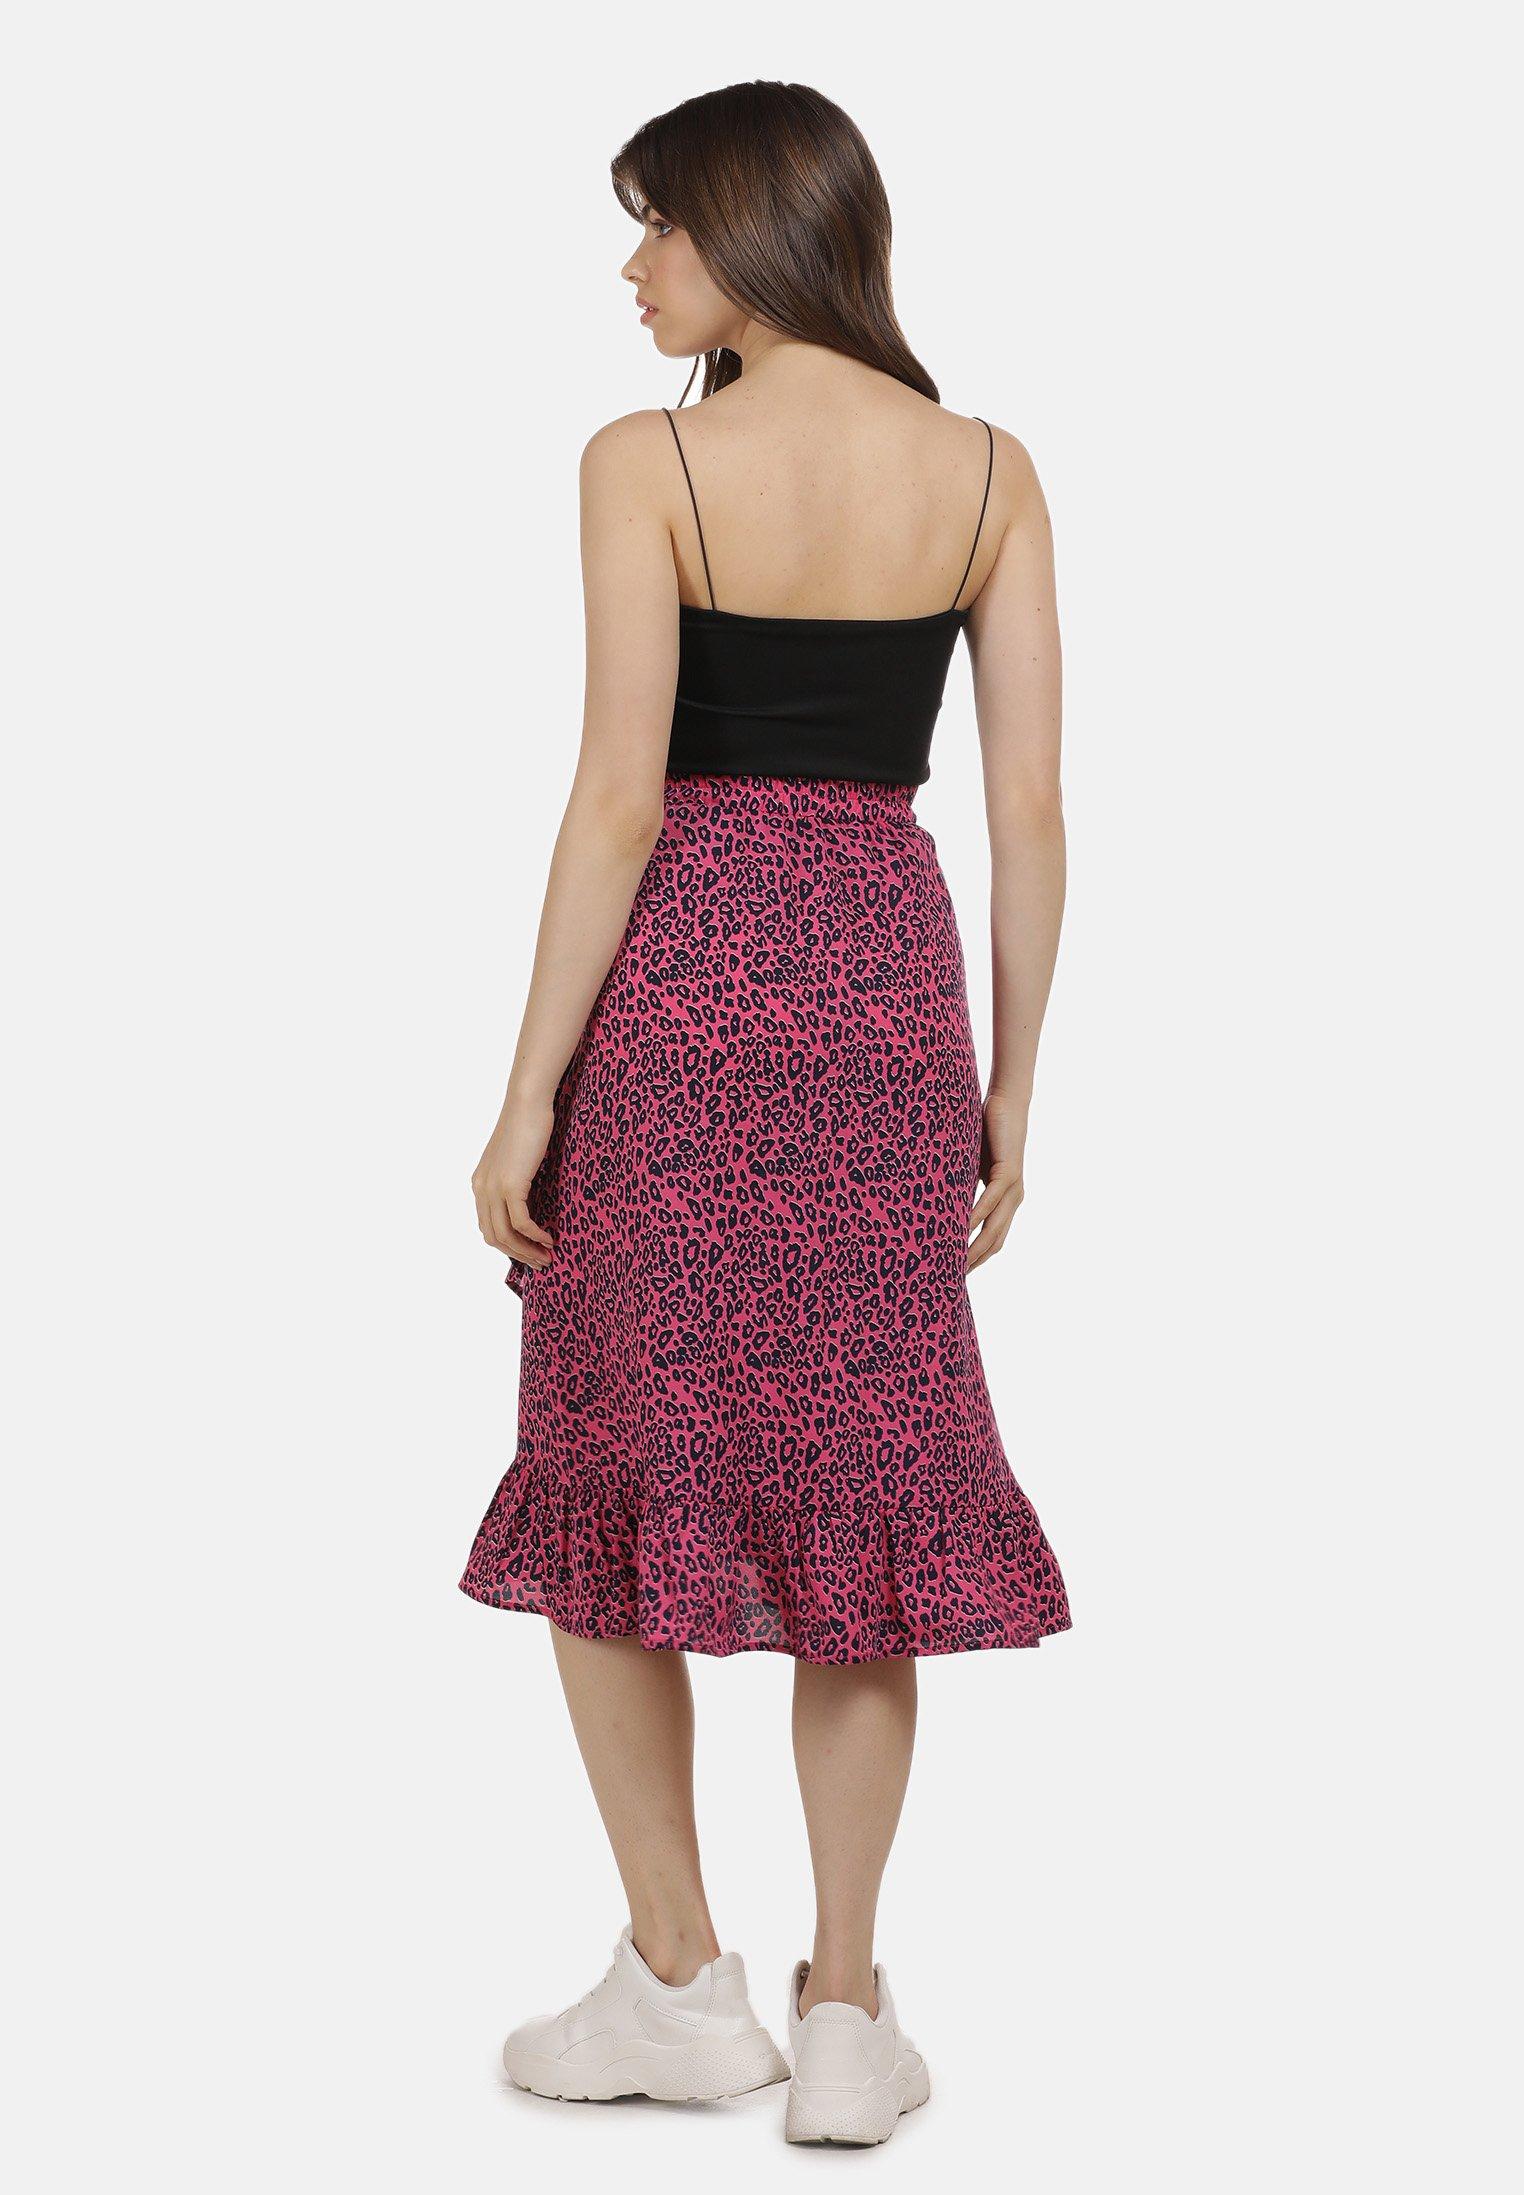 Buy Women's Clothing myMo A-line skirt neon pink leo g5ZaMUbpN